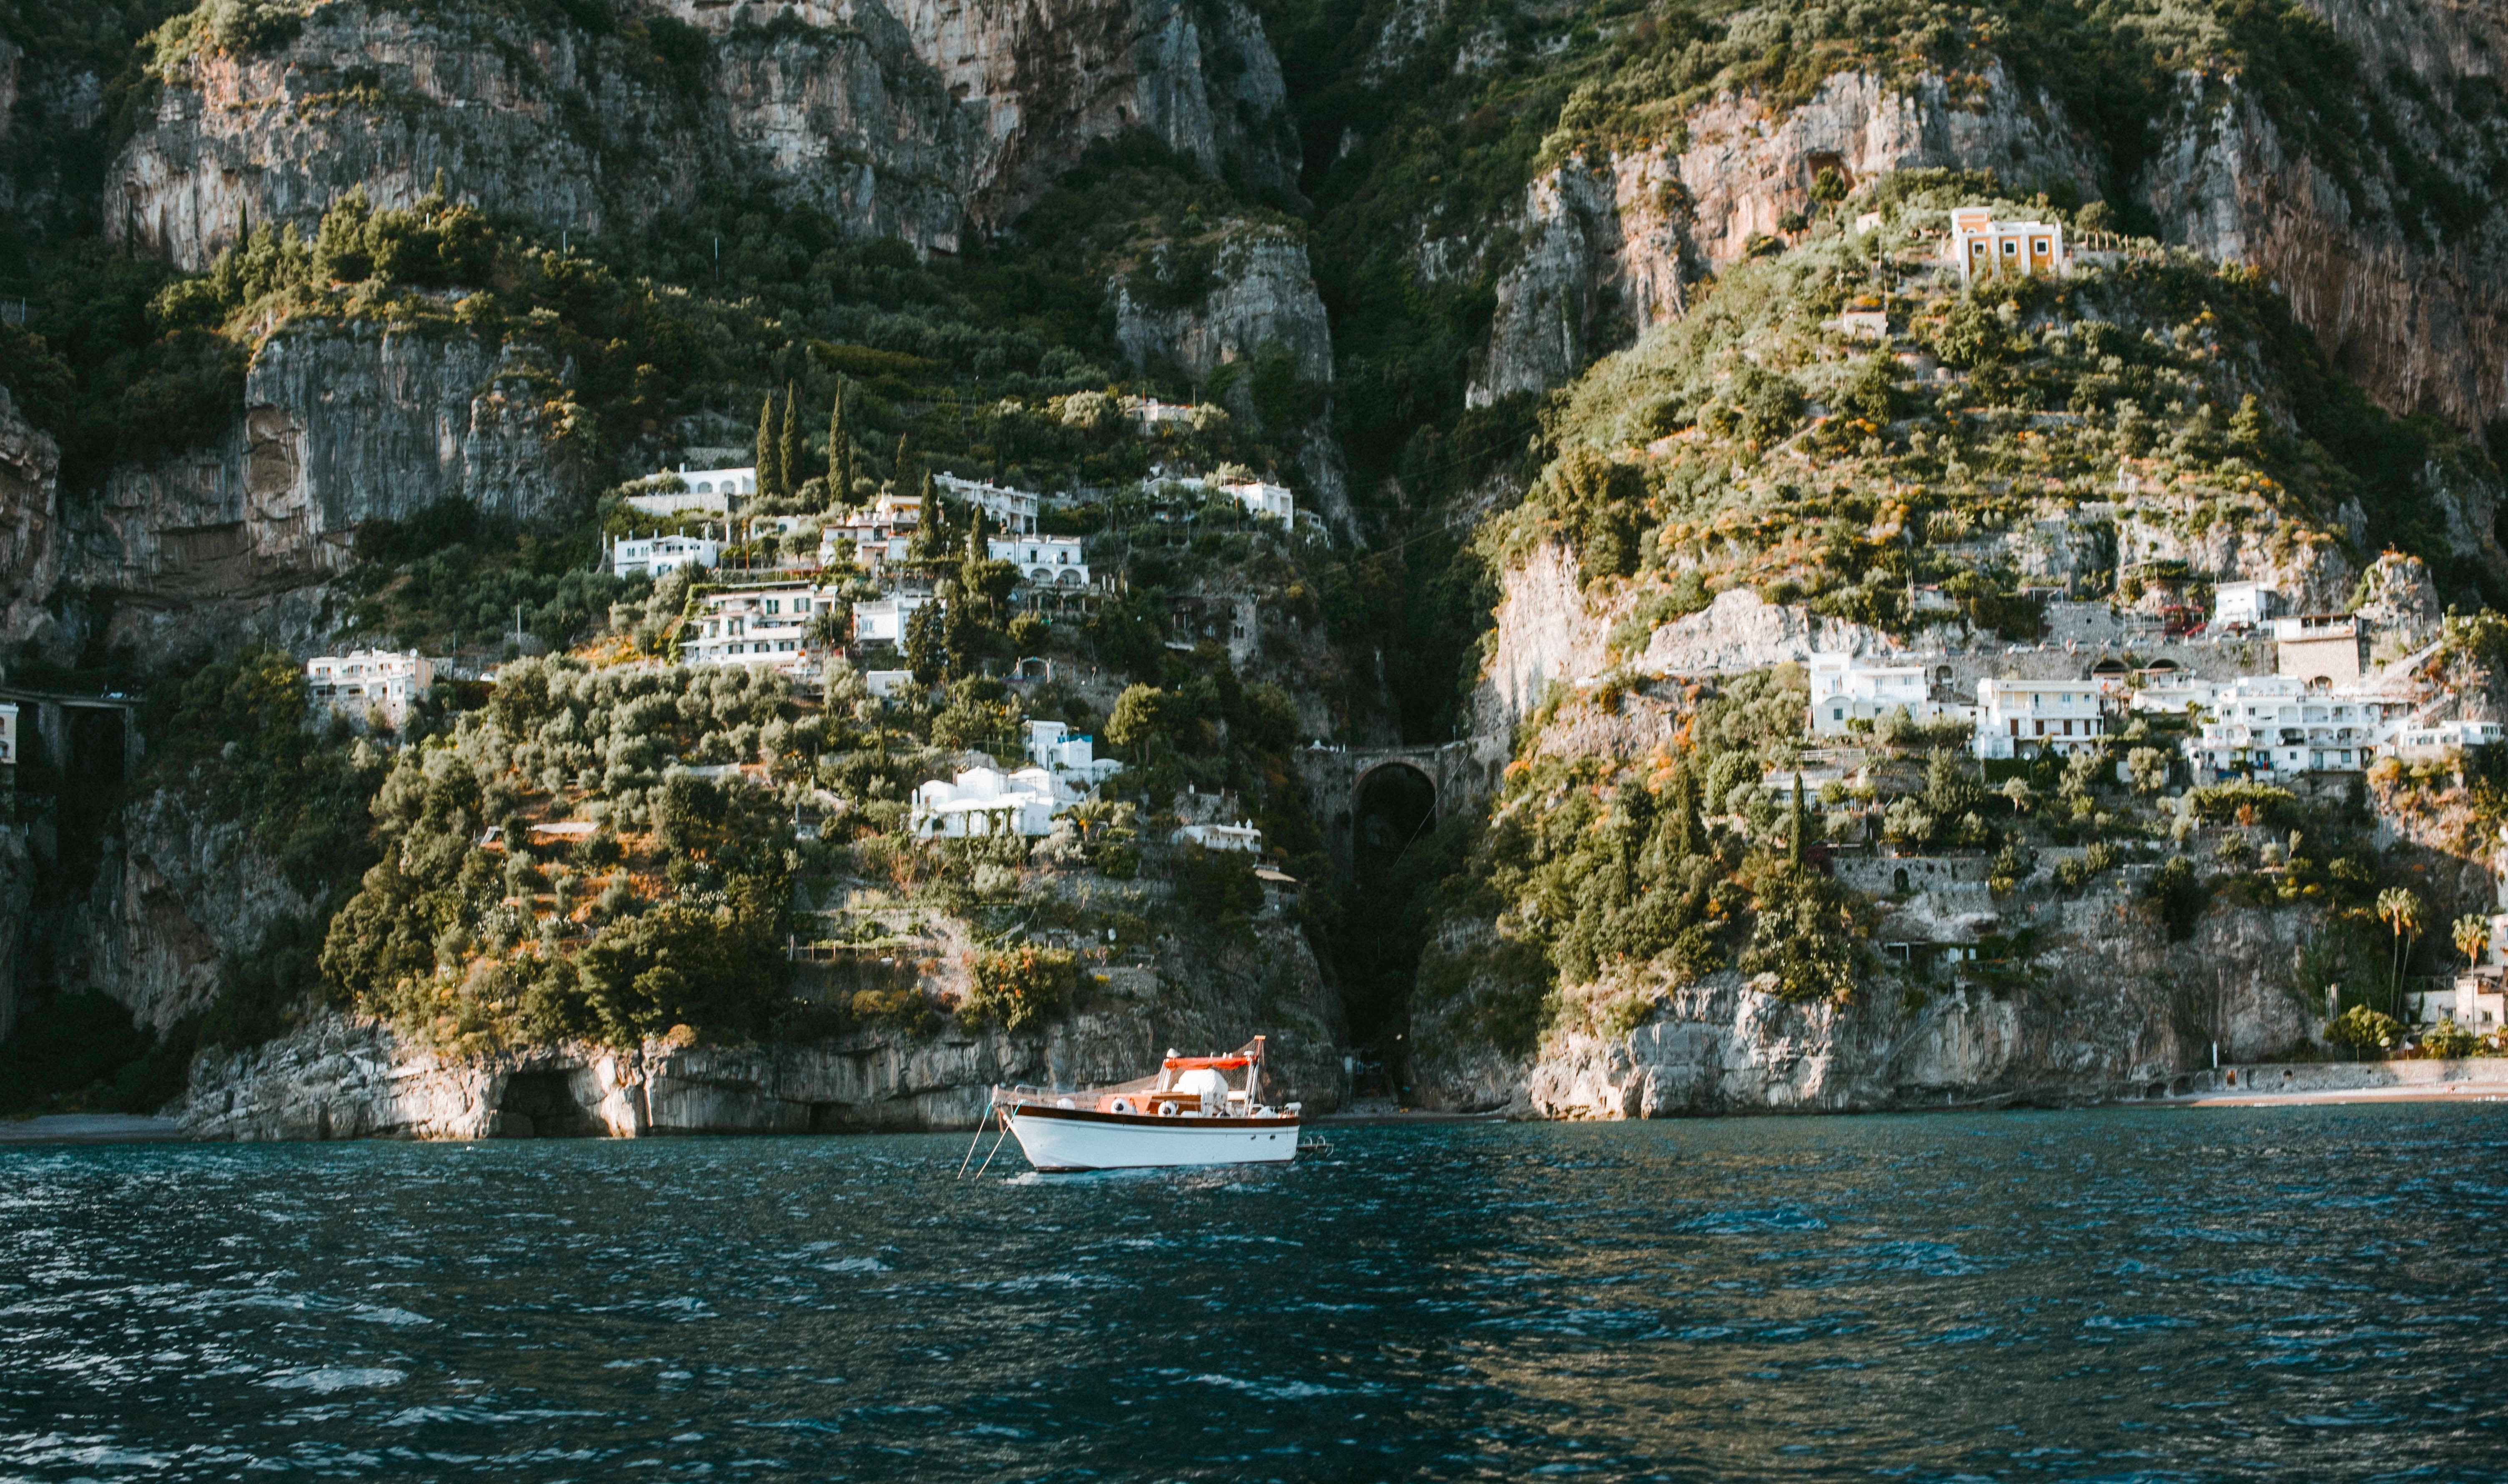 Furore, Italy, Paros, Greece, Antibes. France, Holiday, Beach, Destination, LocalBini, Europe, Water, Castle